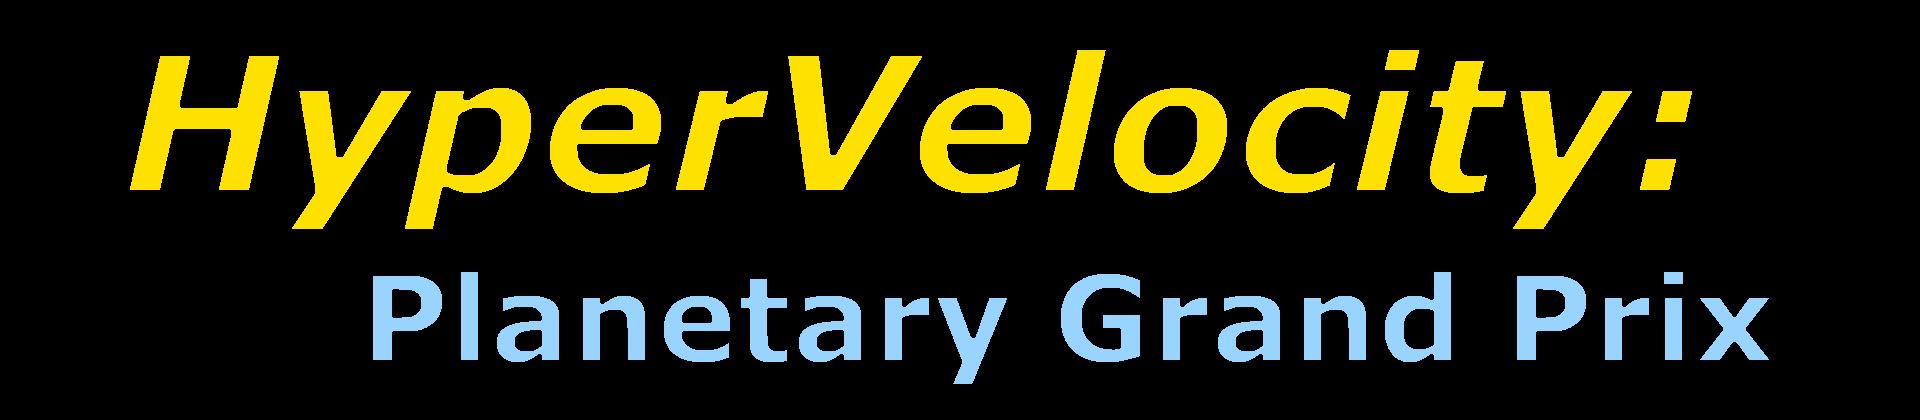 HyperVelocity: Planetary Grand Prix